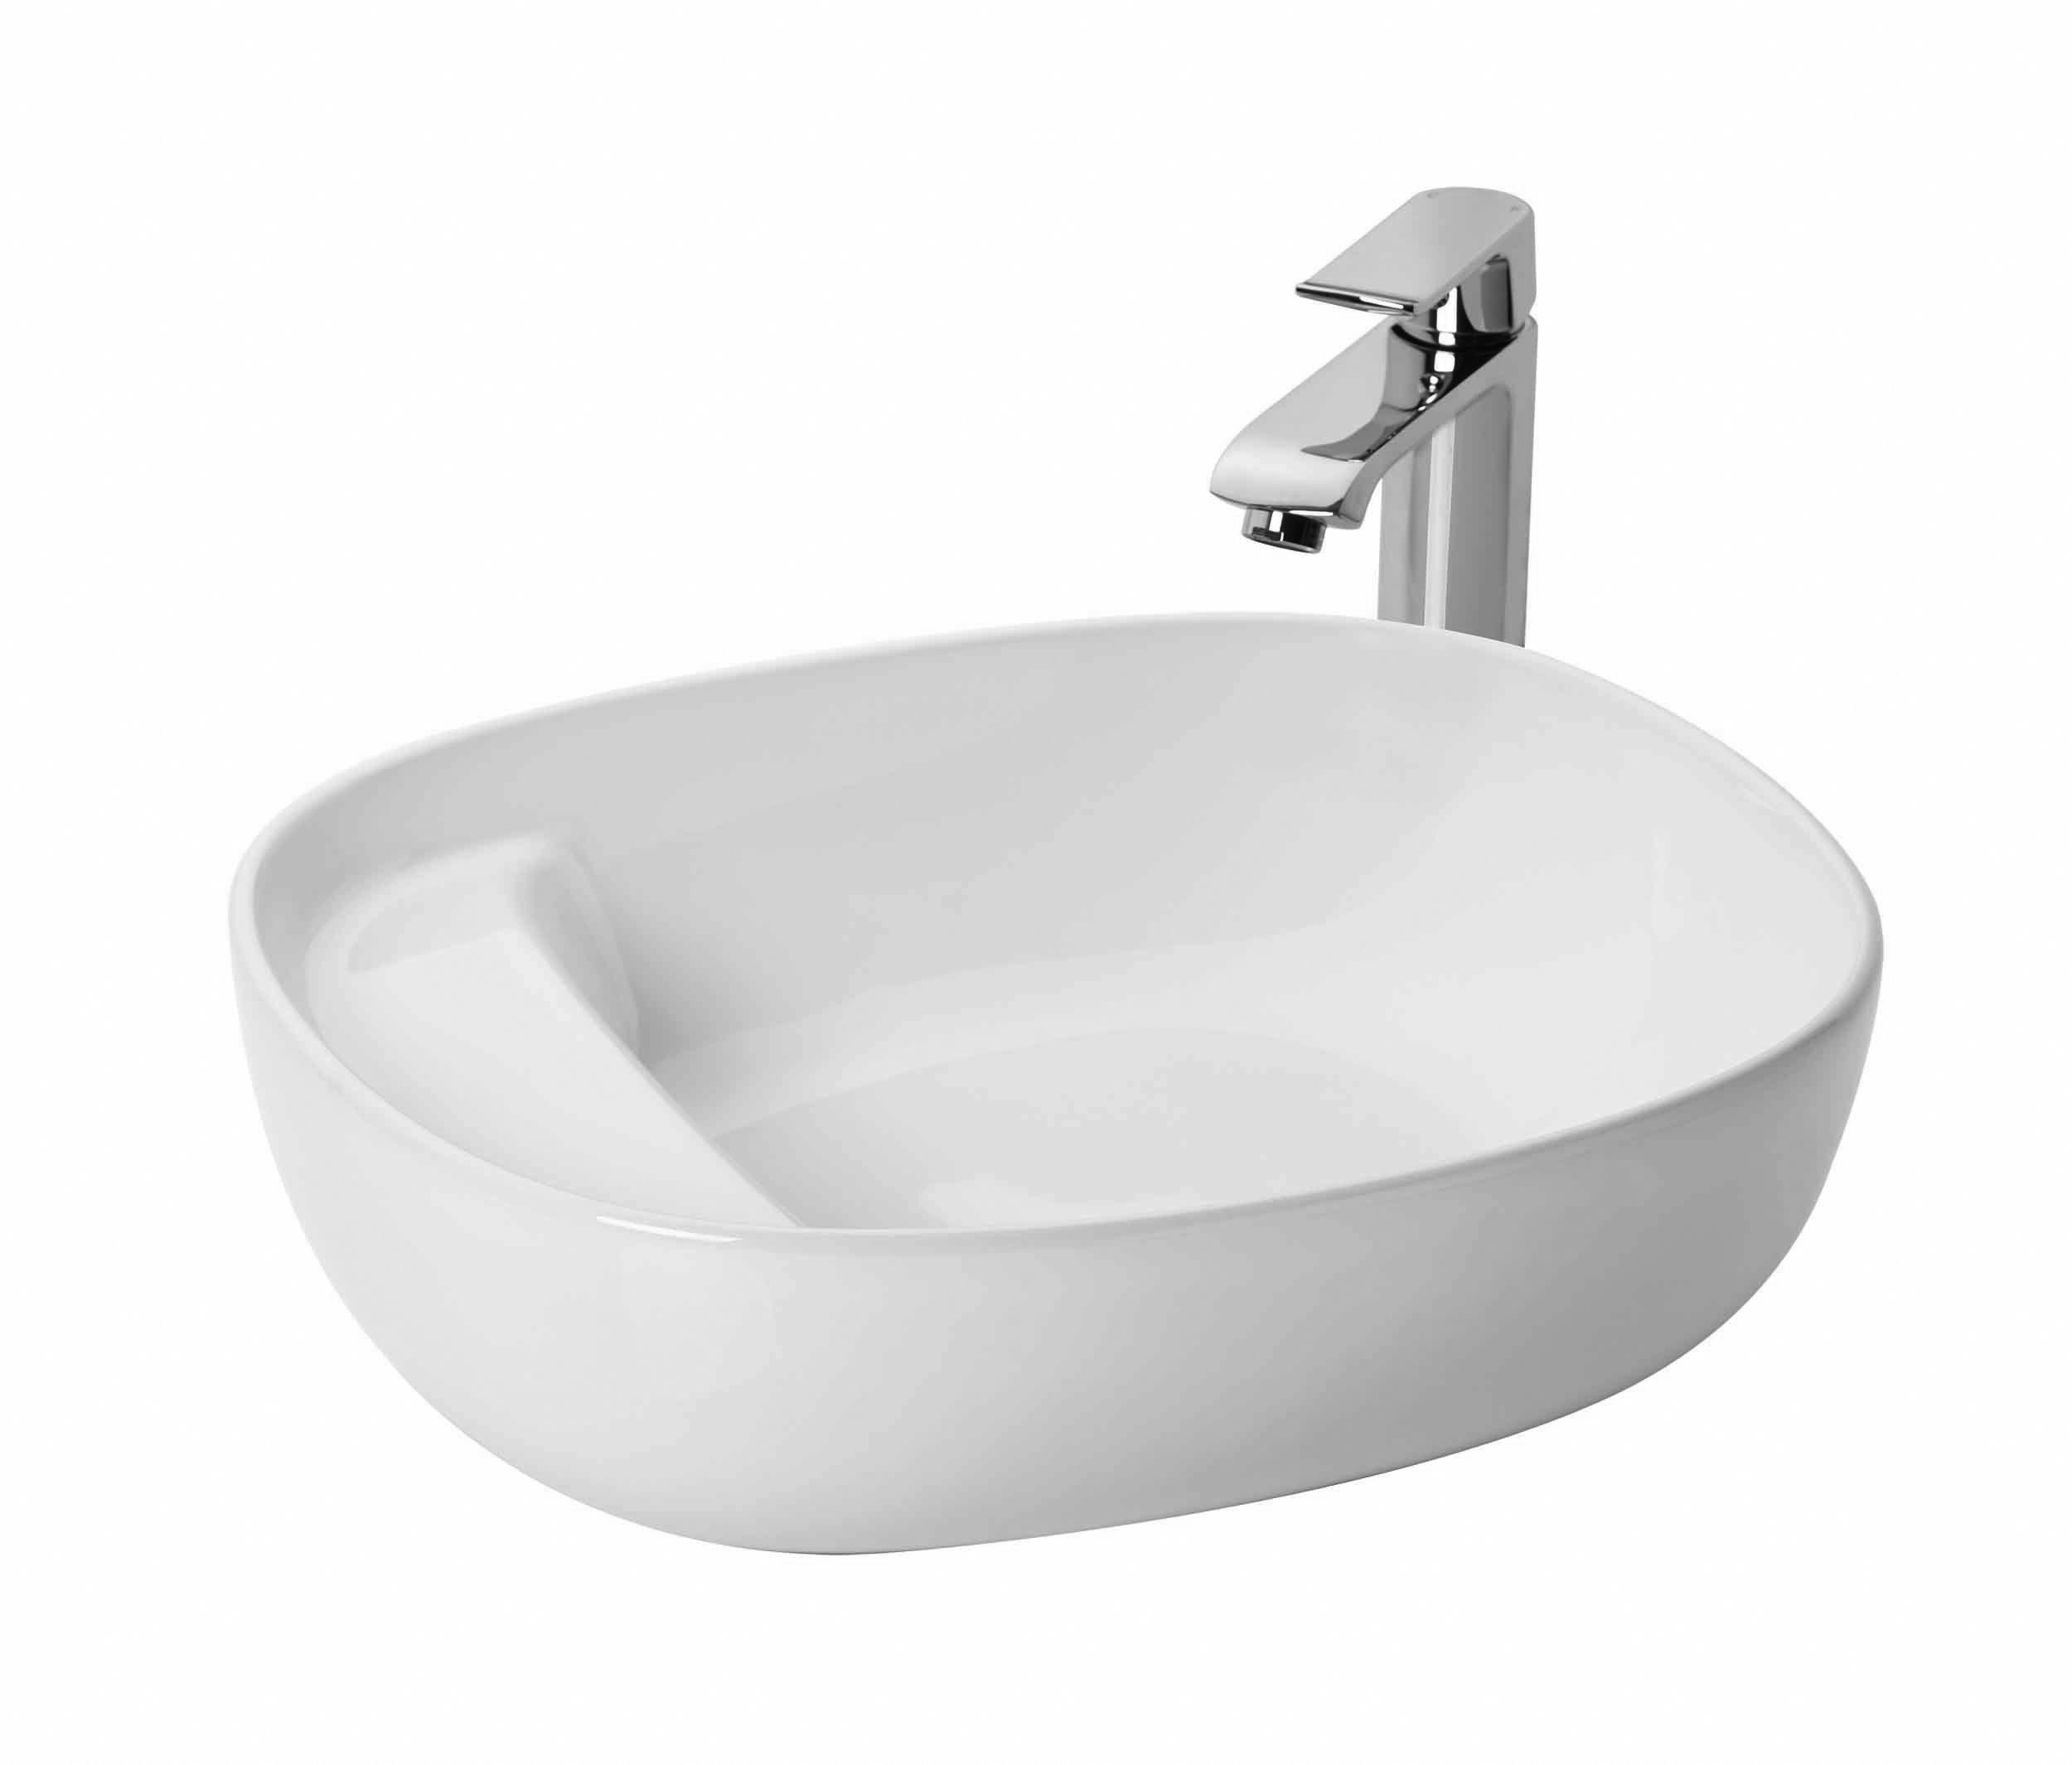 Mansfield Undermount Bathroom Sinks Home sweet home